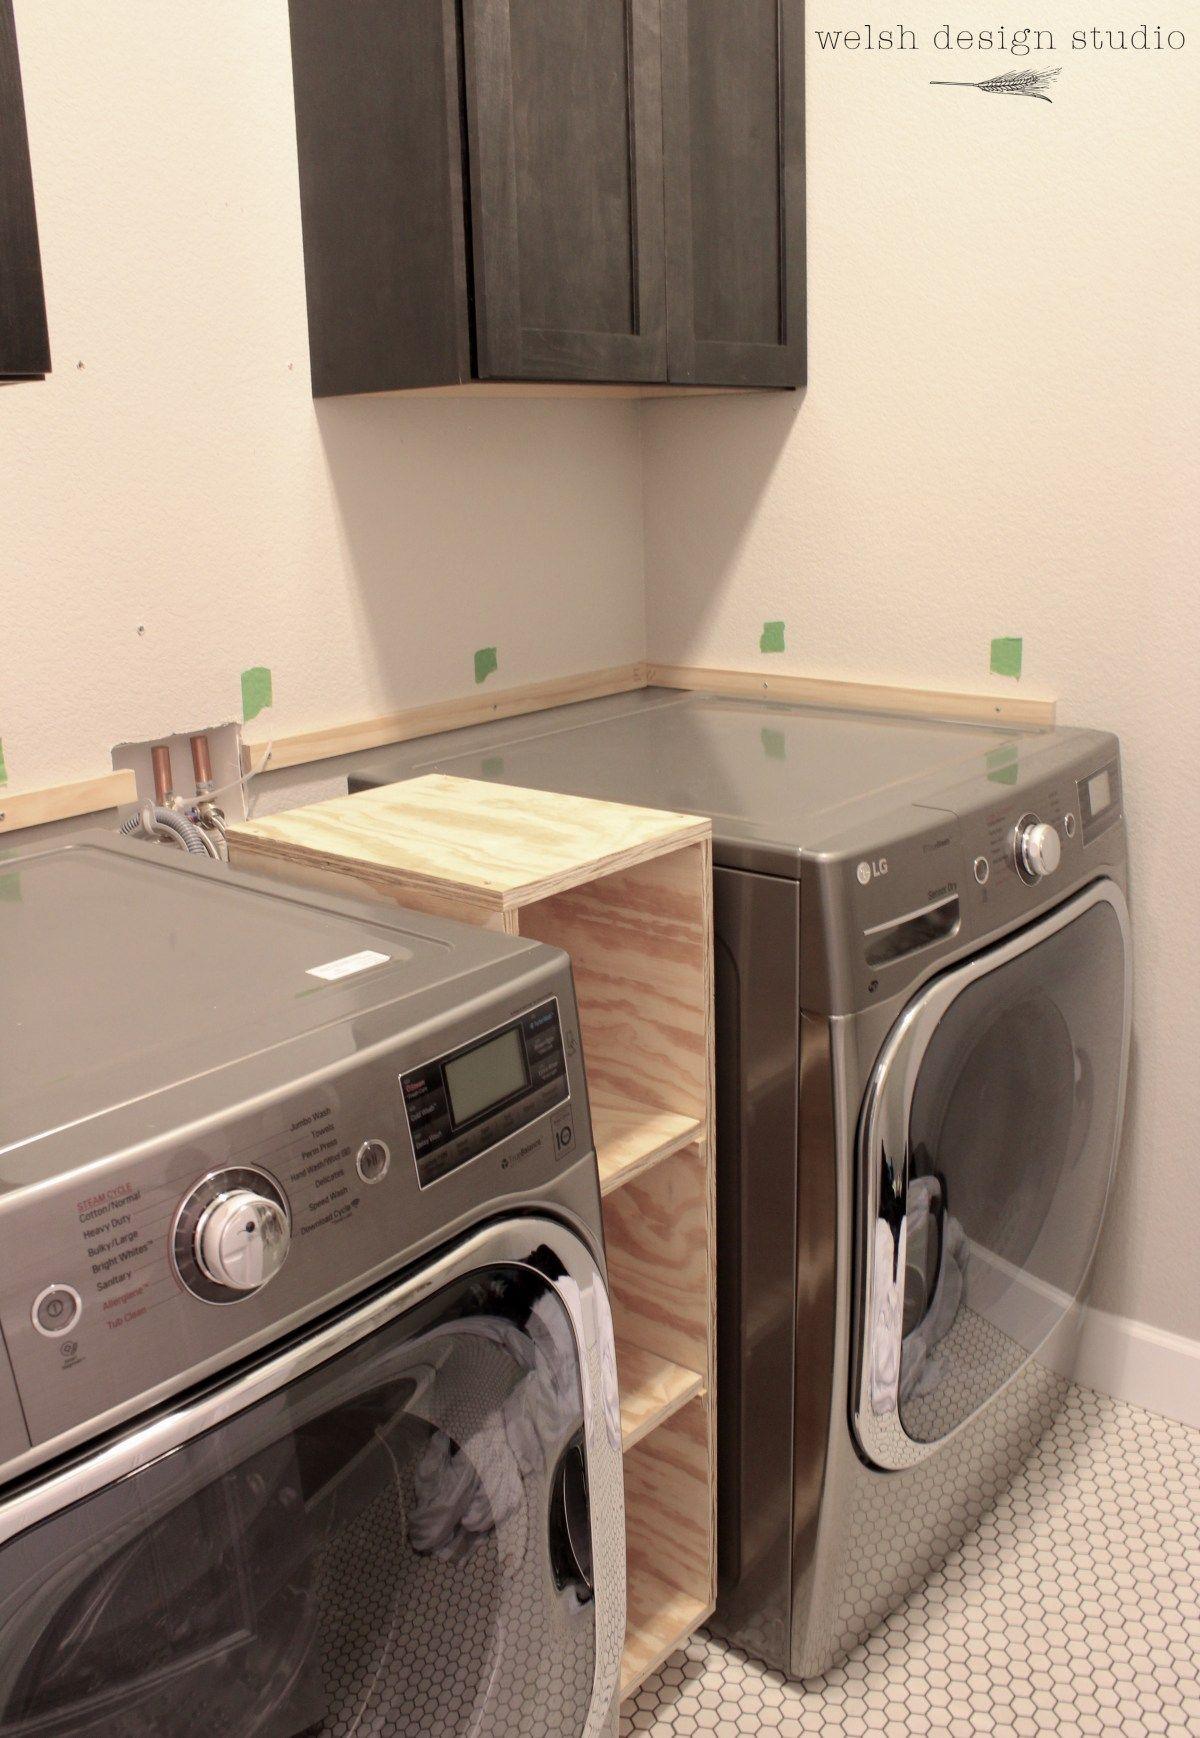 Photo of A Quick Laundry Room Progress Update – Welsh Design Studio